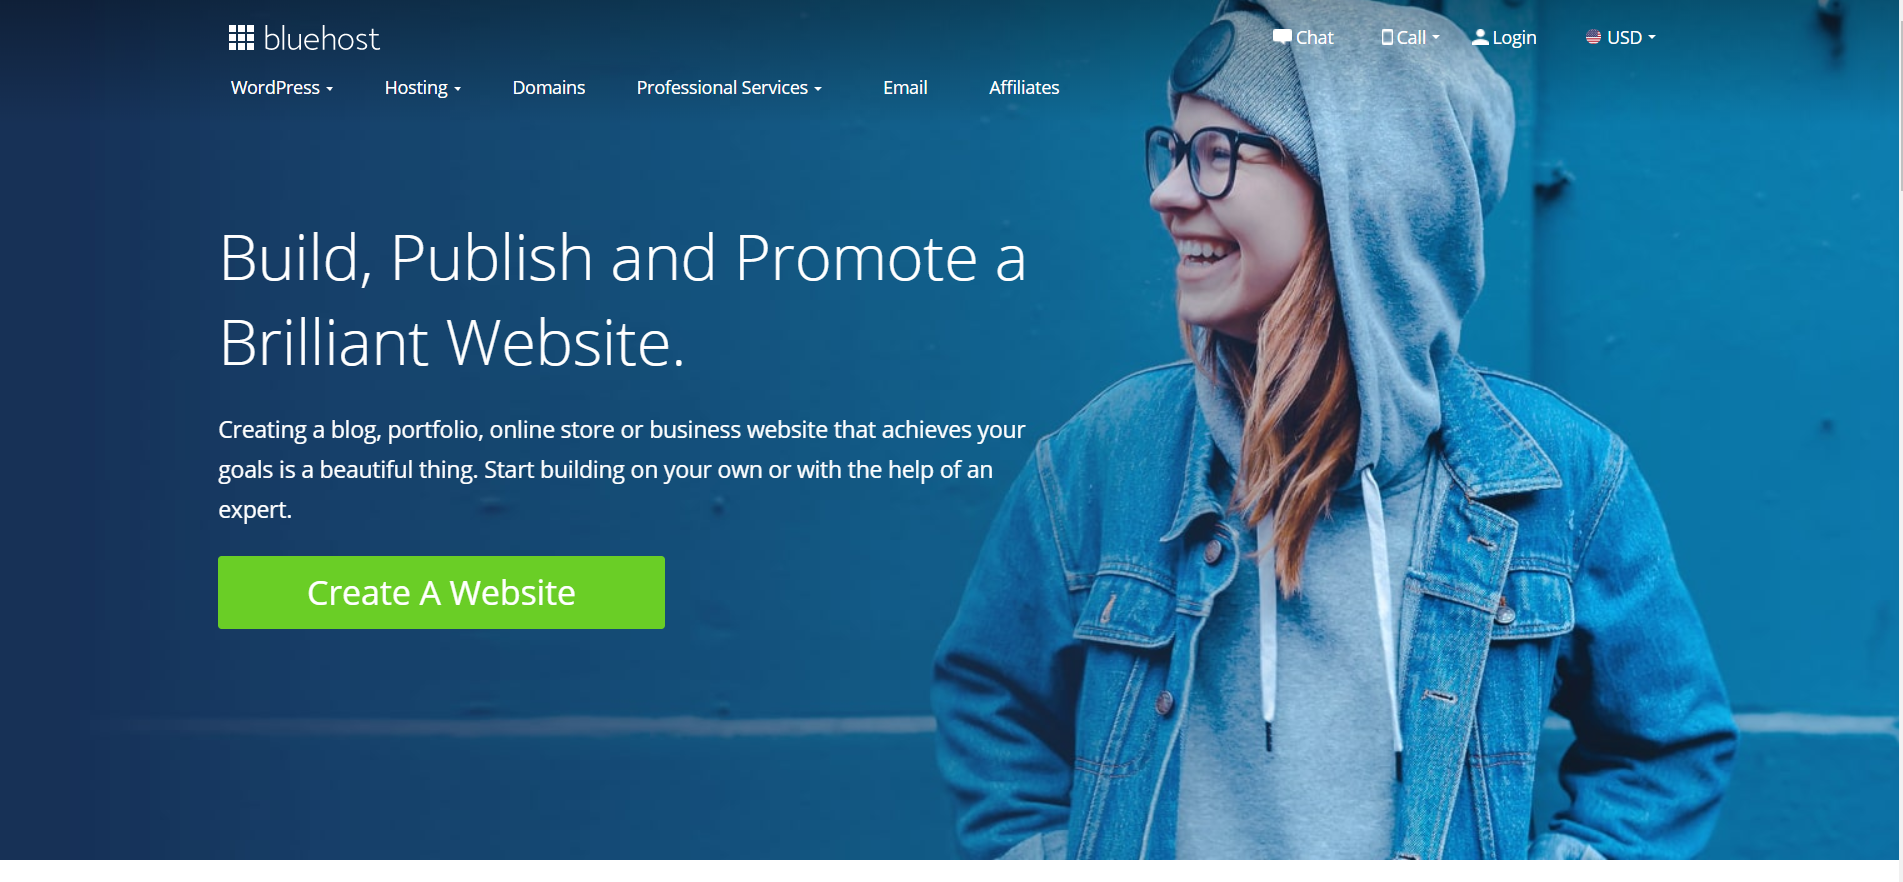 bluehost-homepage-myvu